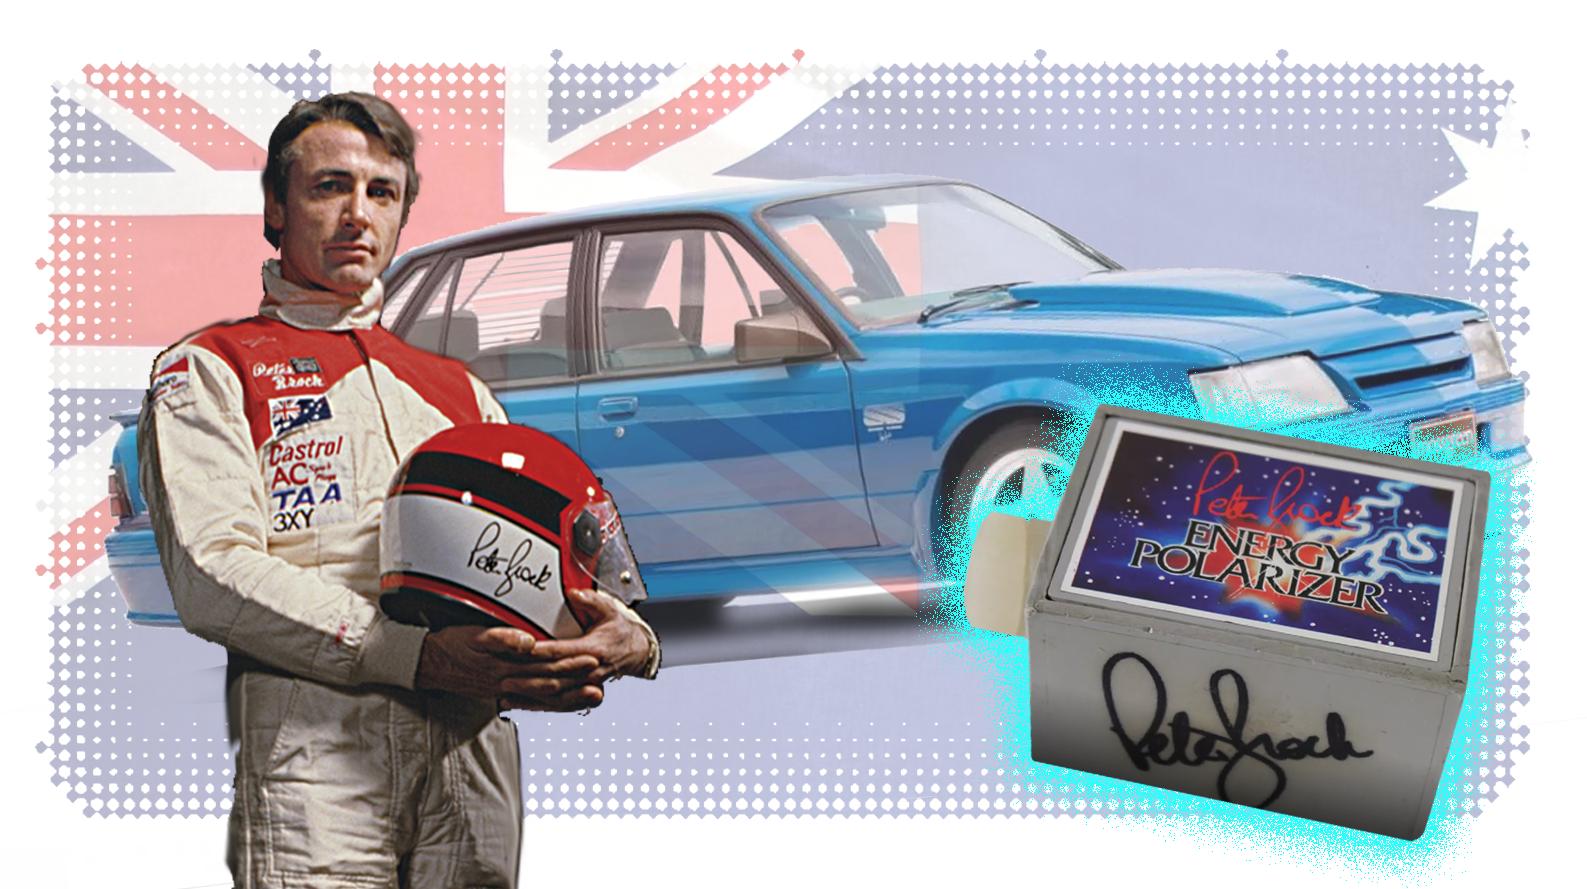 australia car-history holden jalopnik peter-brock racing